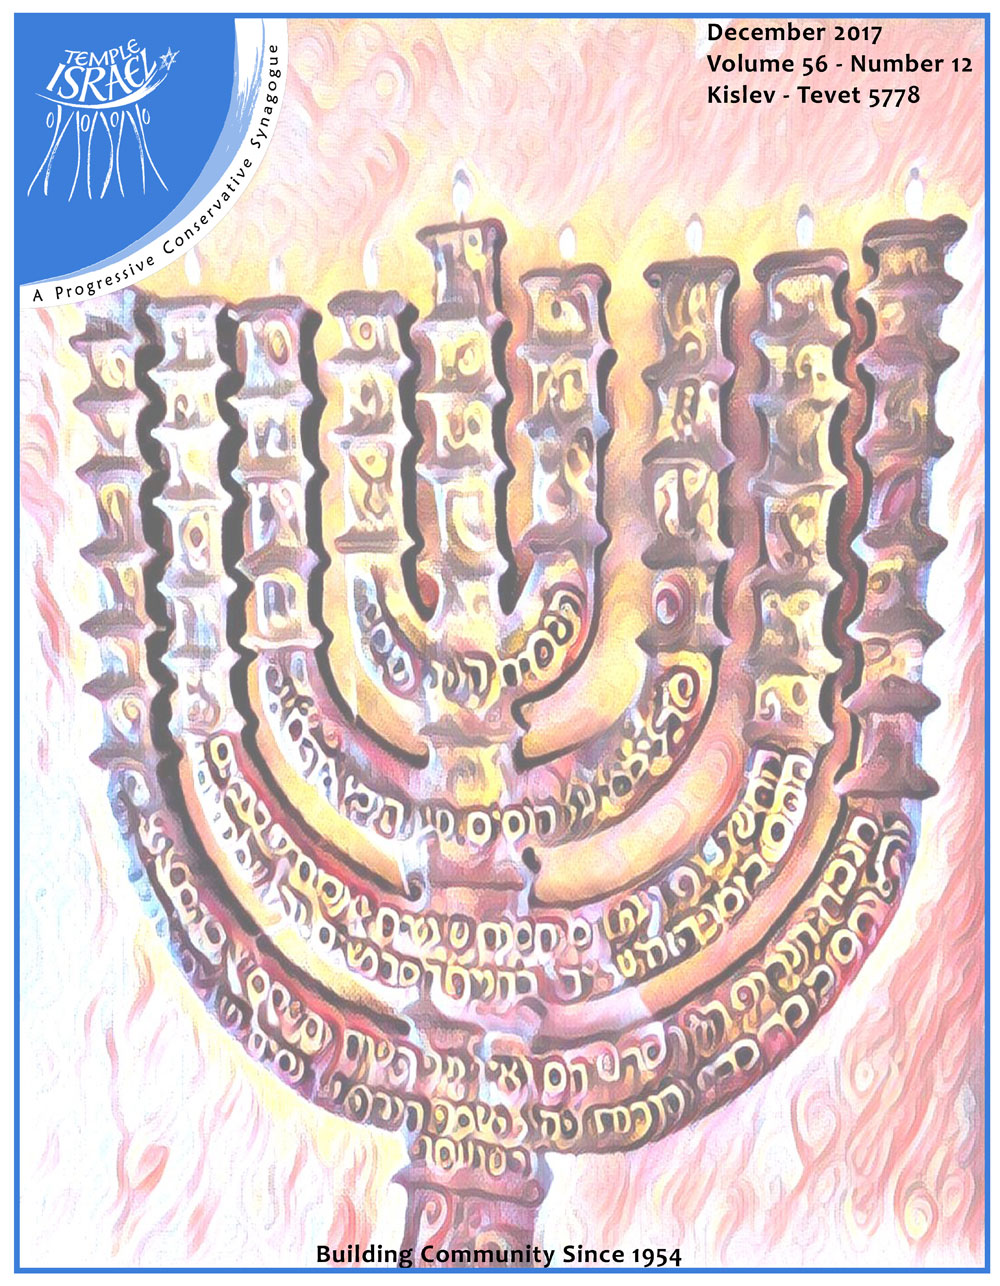 Temple Israel December 2017 Bulletin